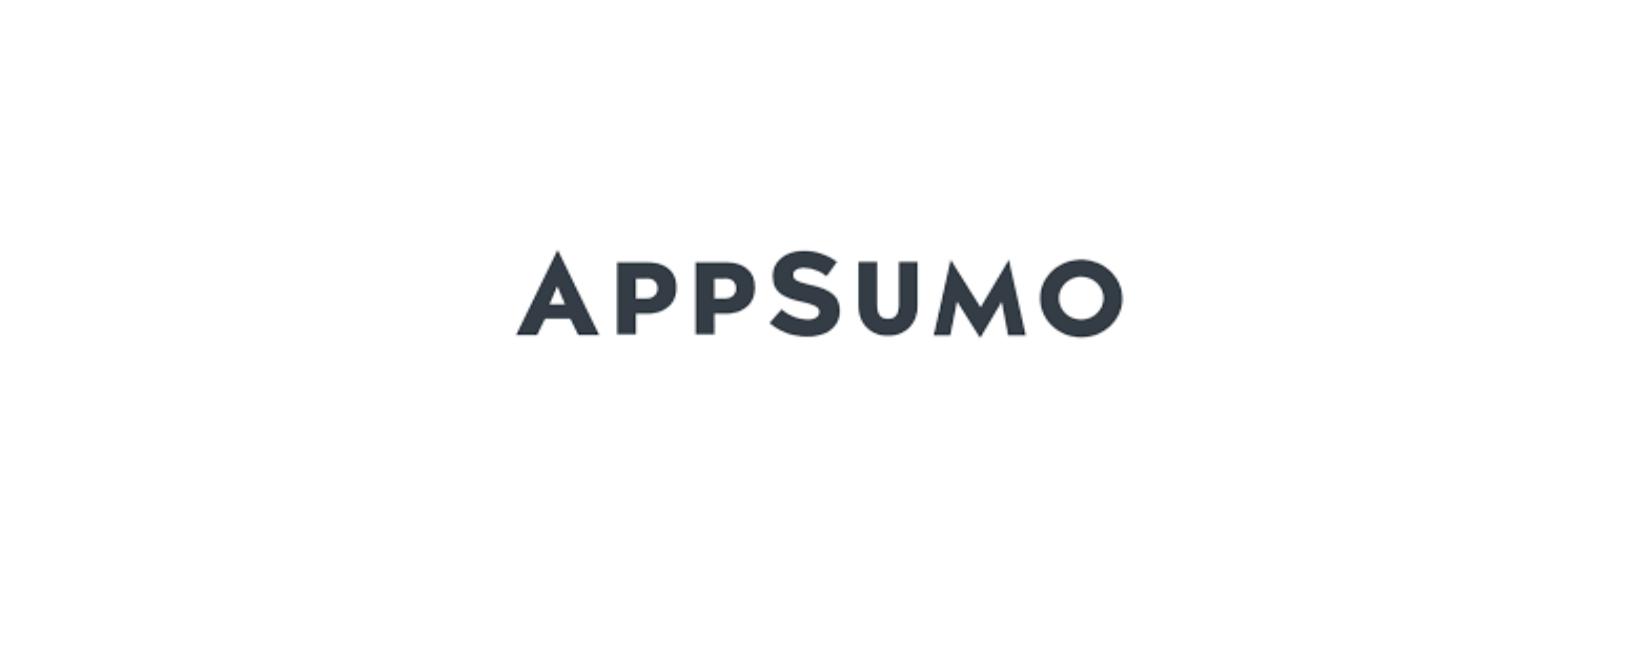 AppSumo Discount Code 2021